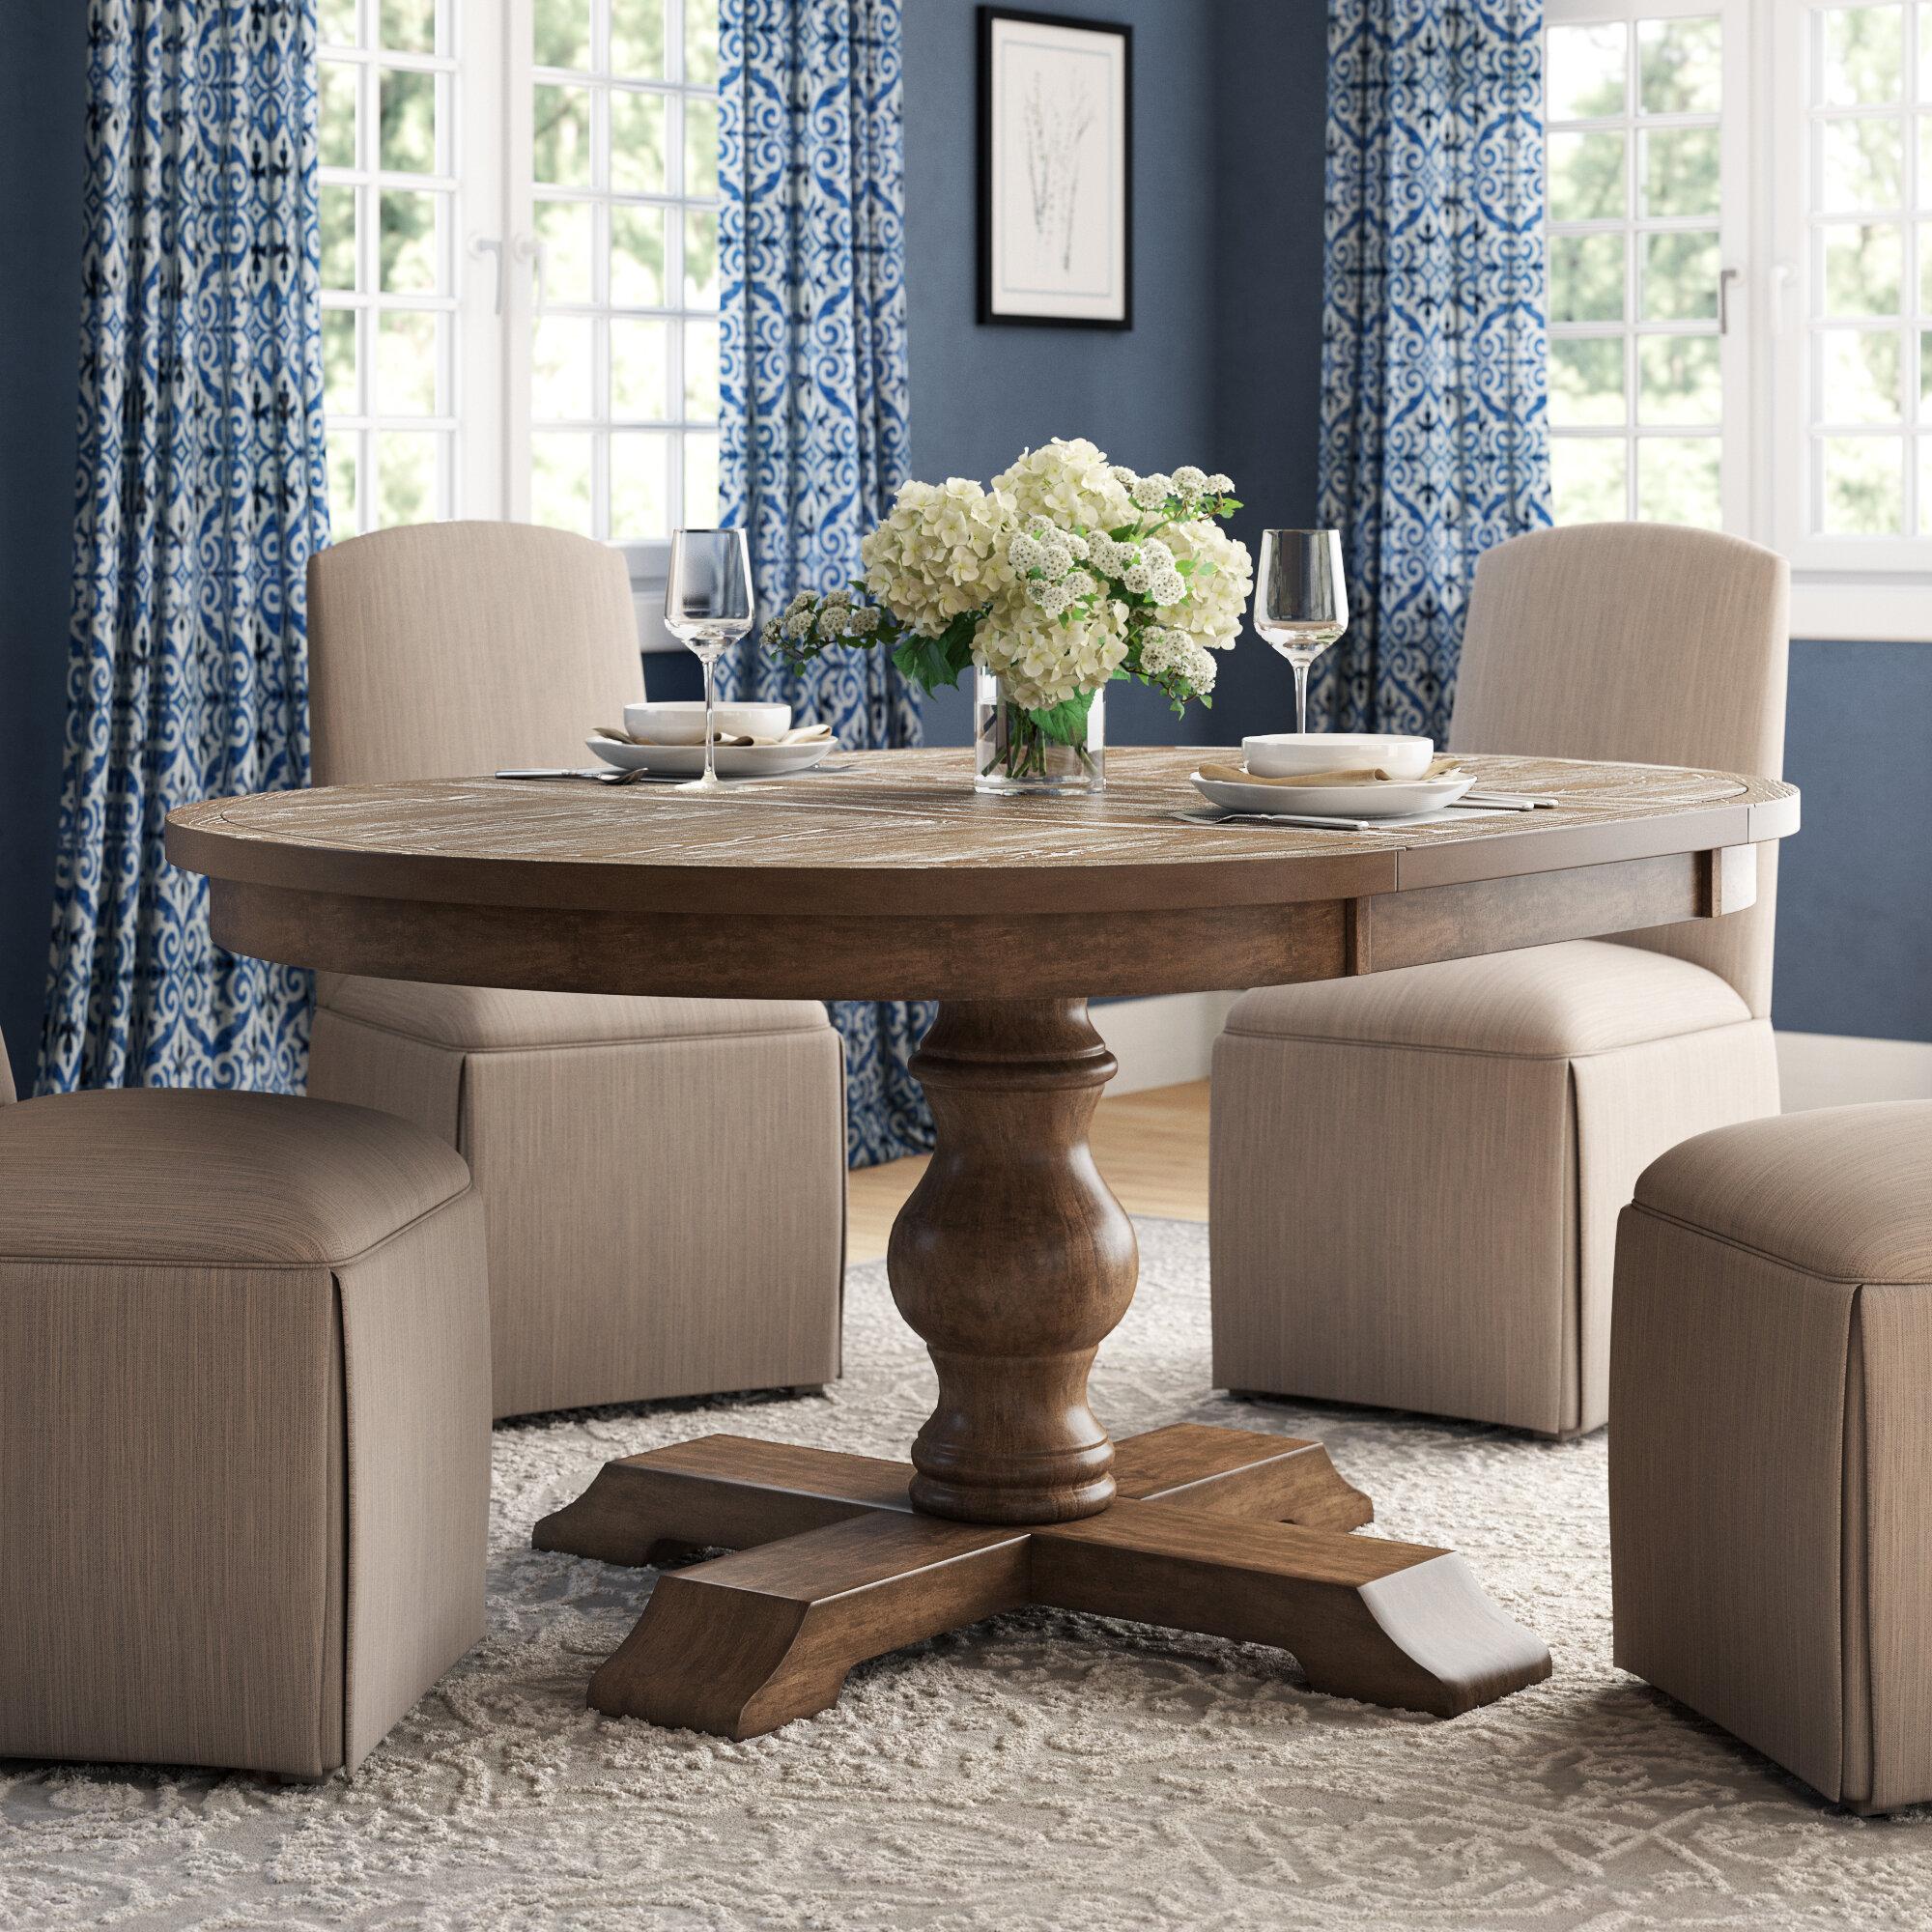 Etonnant Laurel Foundry Modern Farmhouse Fortunat Extendable Dining Table U0026 Reviews  | Wayfair